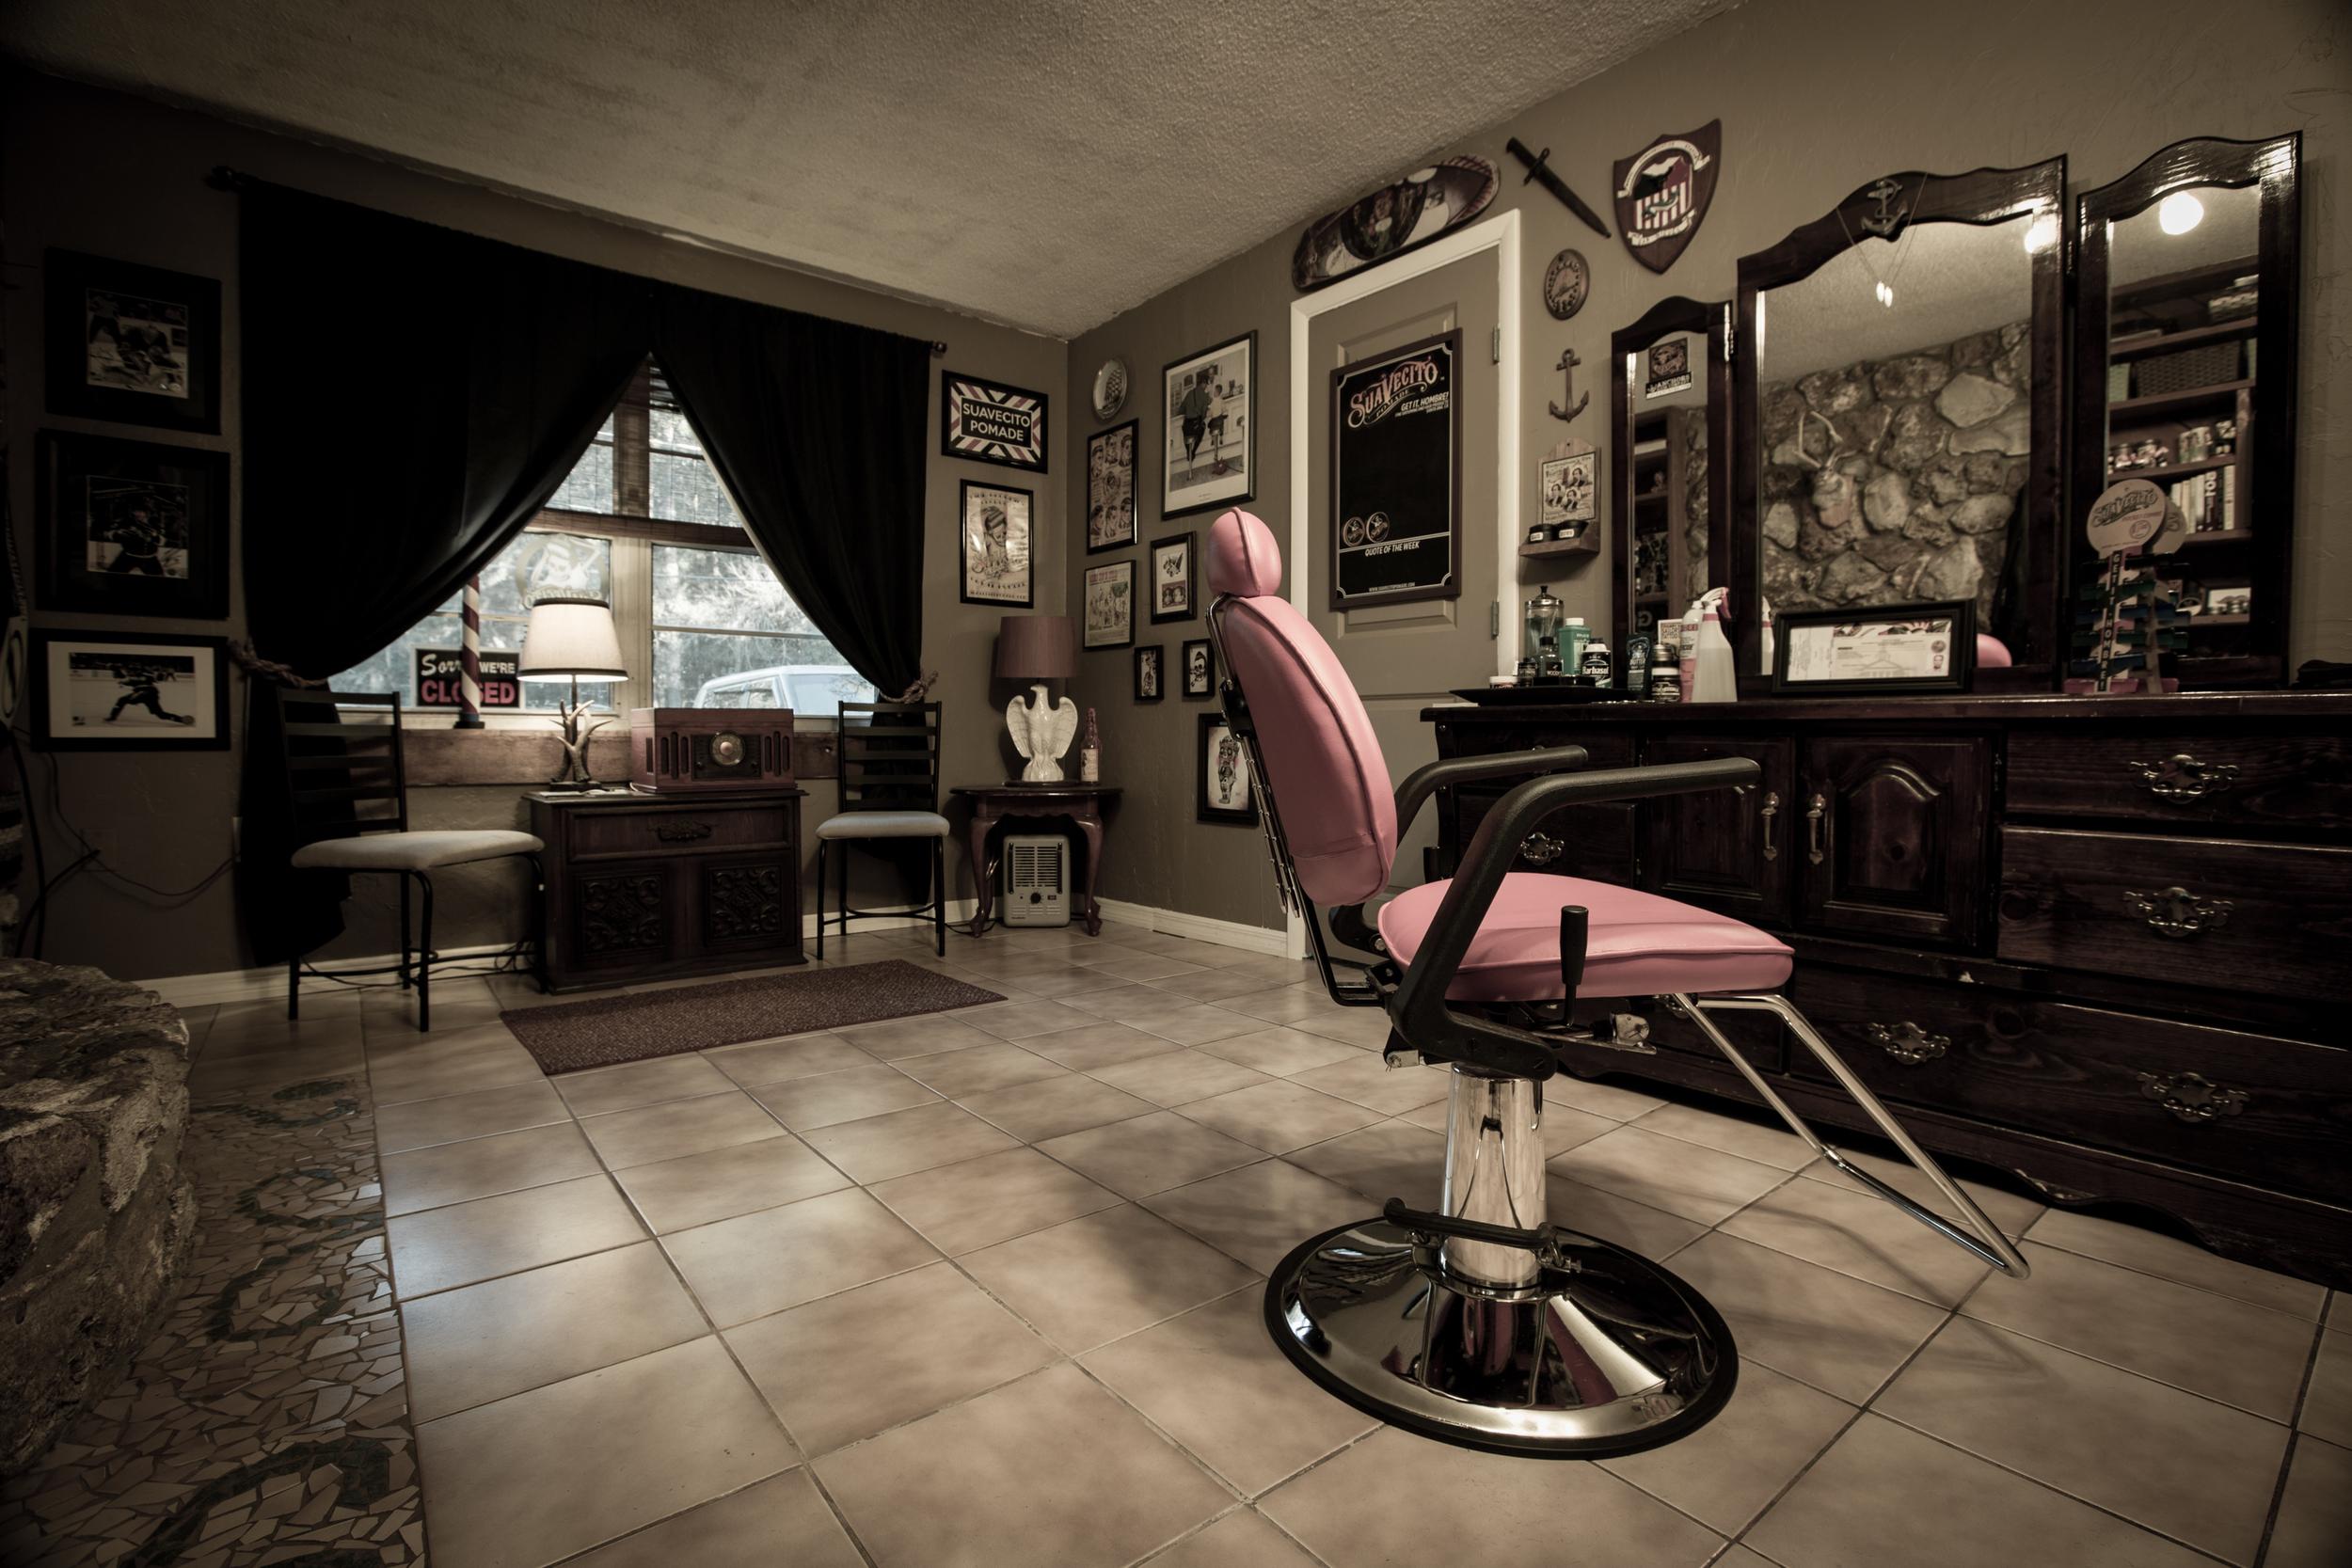 141124_top_notch_haircuts-24.jpg